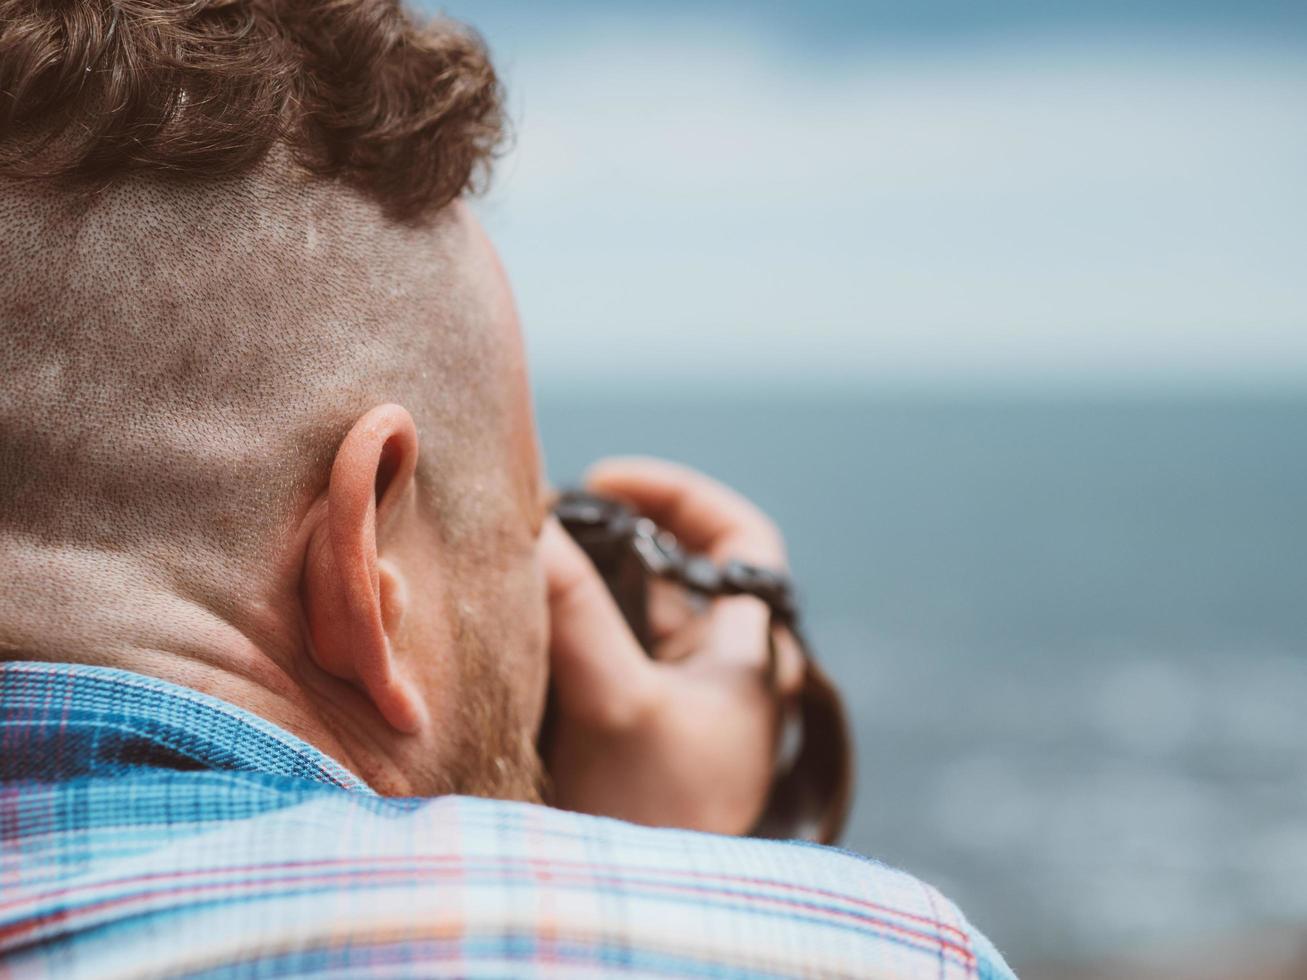 Male holds camera towards sea photo